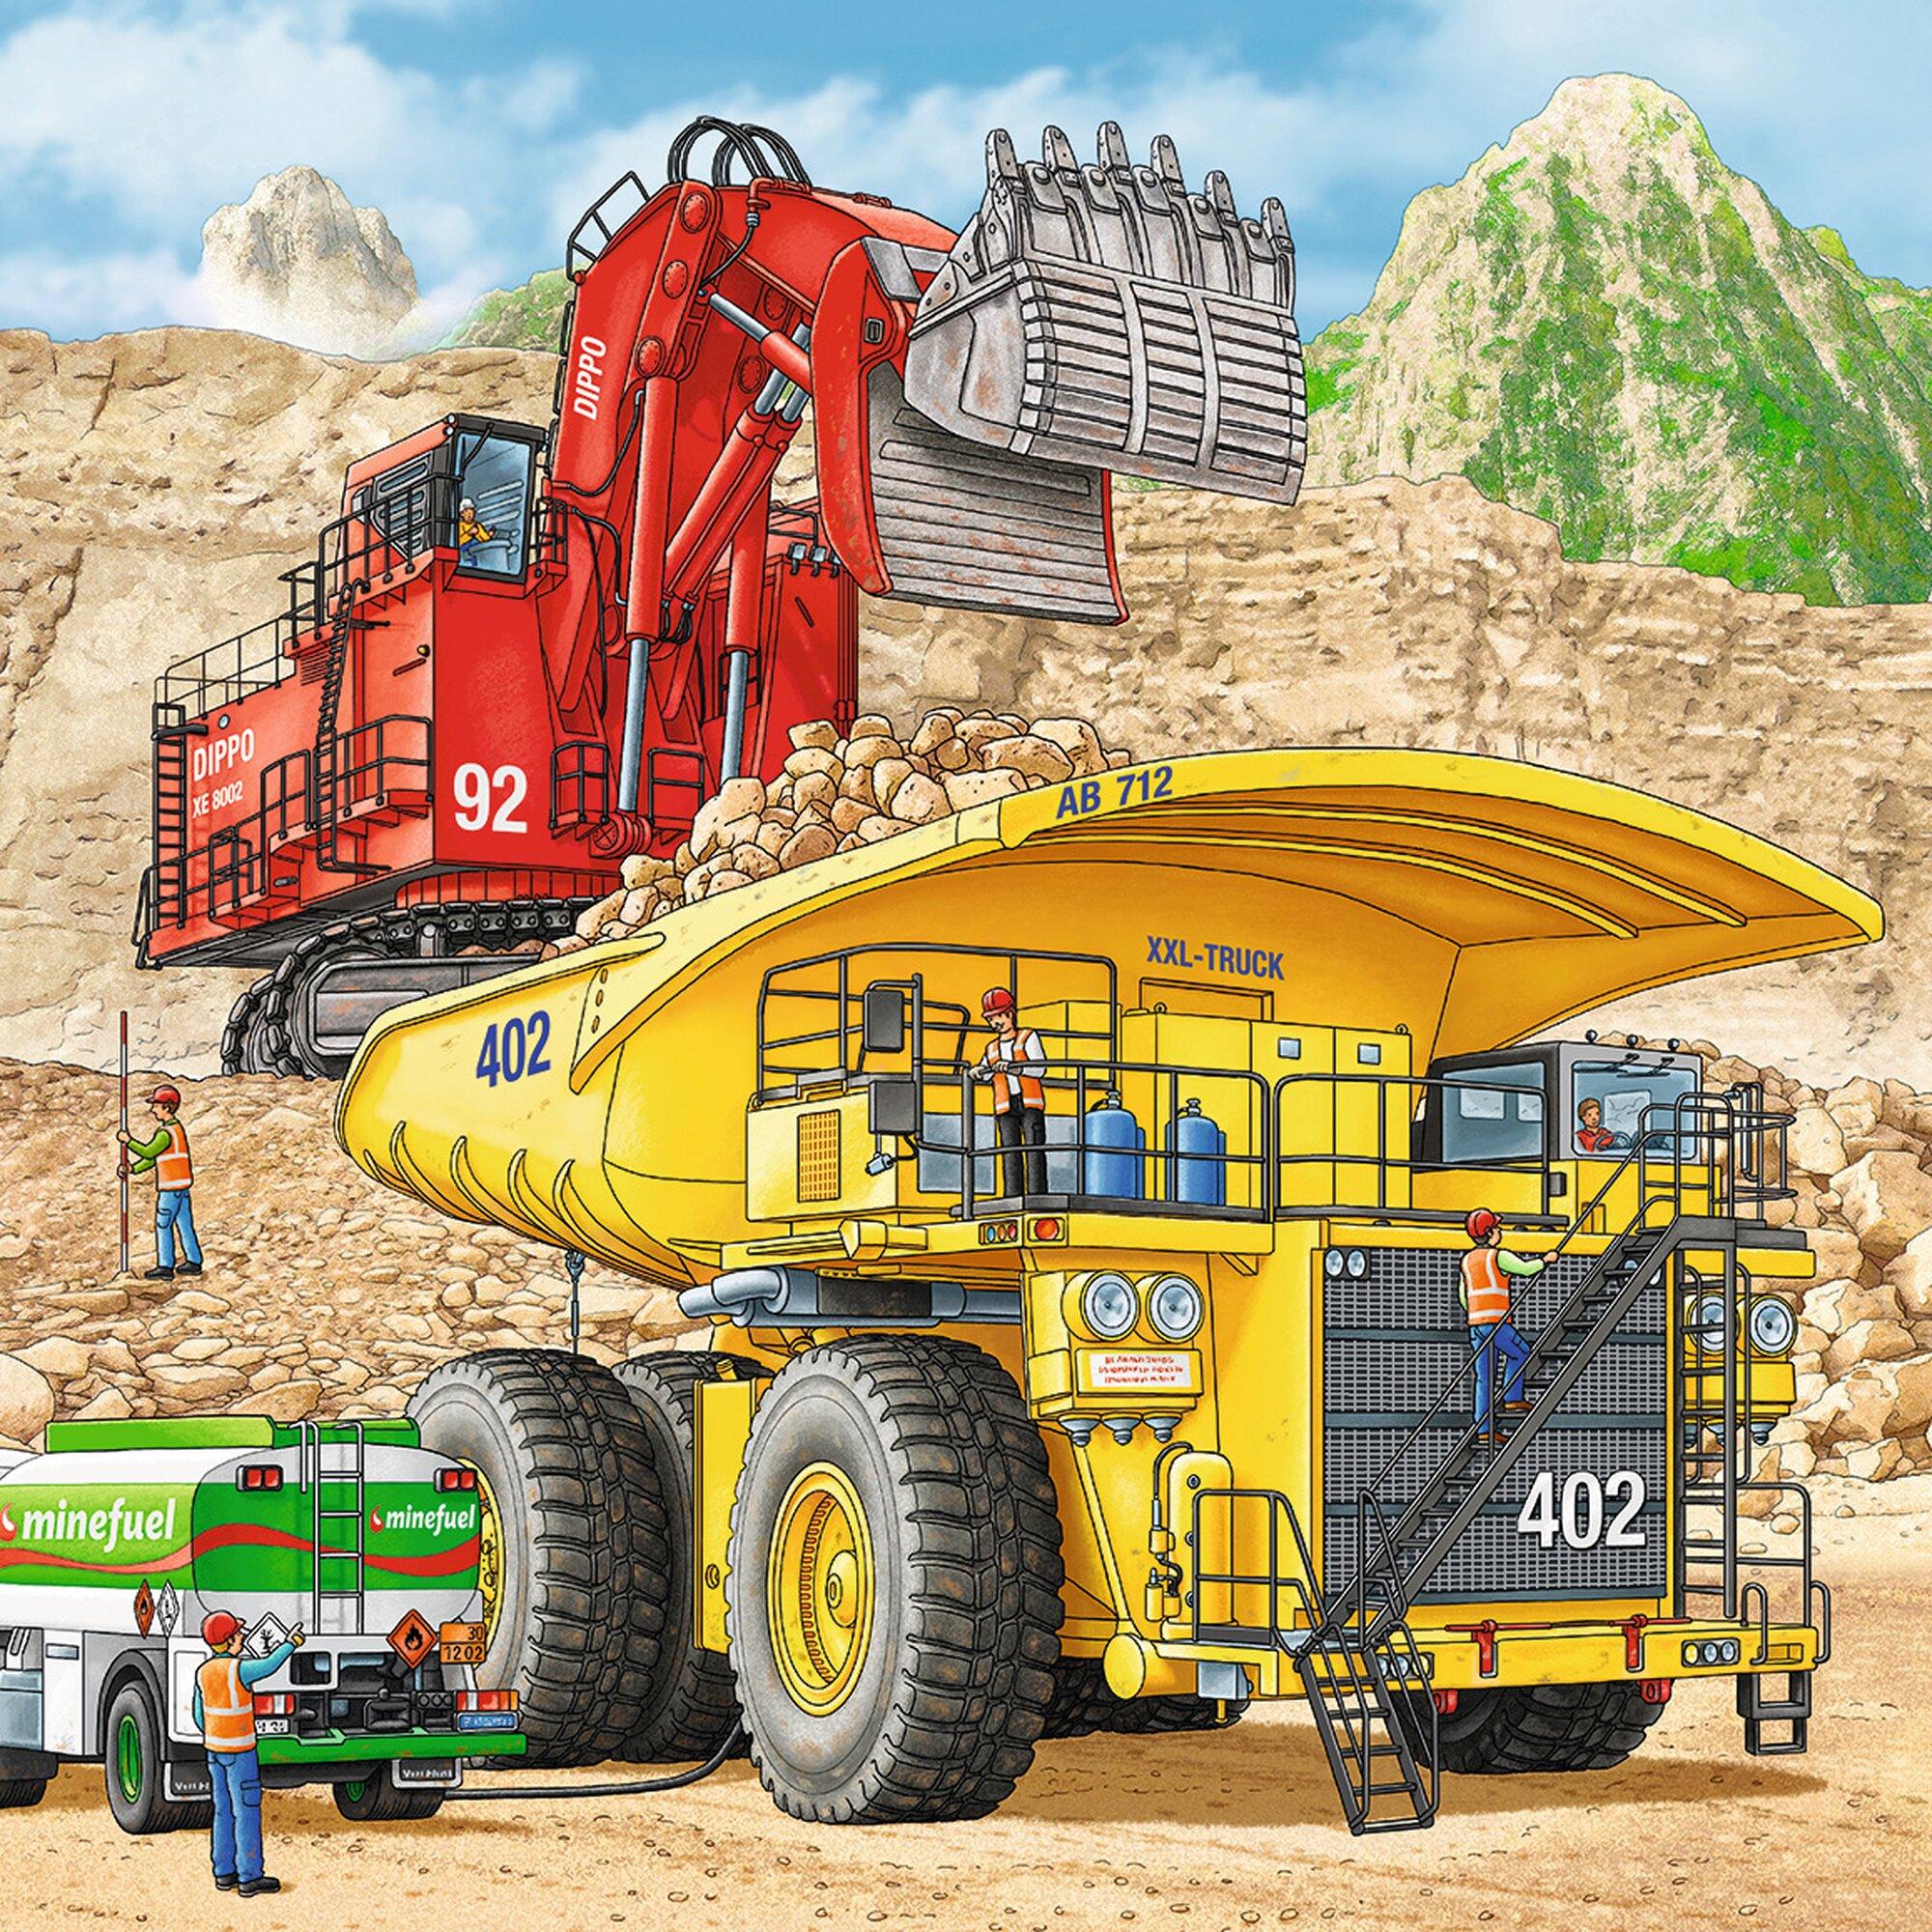 ravensburger-drei-kinderpuzzles-inkl-mini-postern-49-teile-gro-e-maschinen